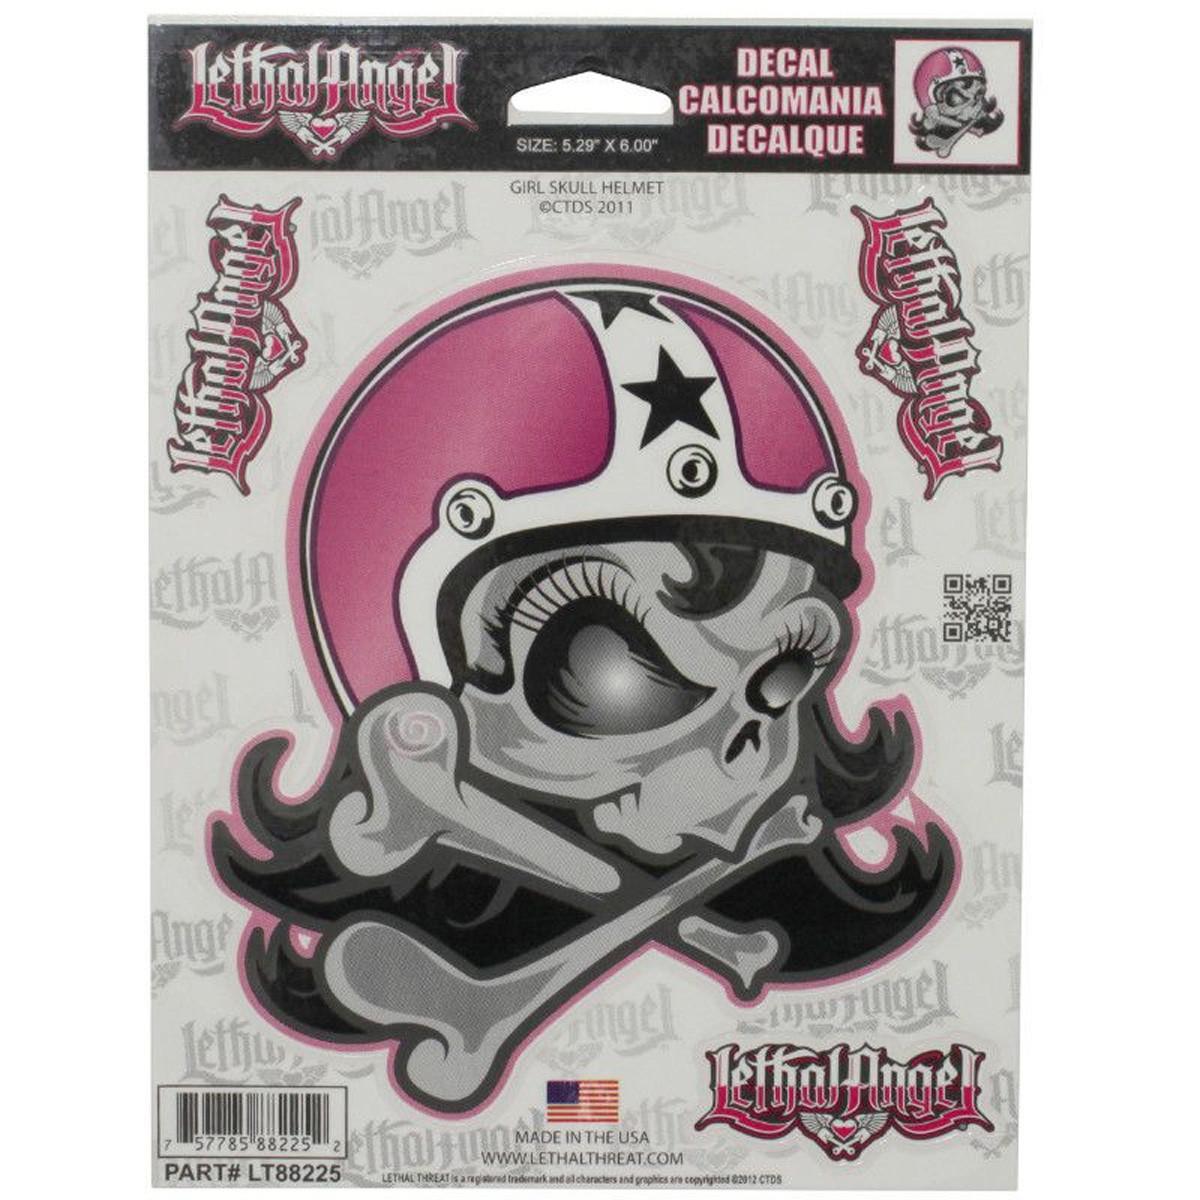 Autocollant / Sticker - LETHAL THREAT Girl Skull Helmet 15 x 20cm